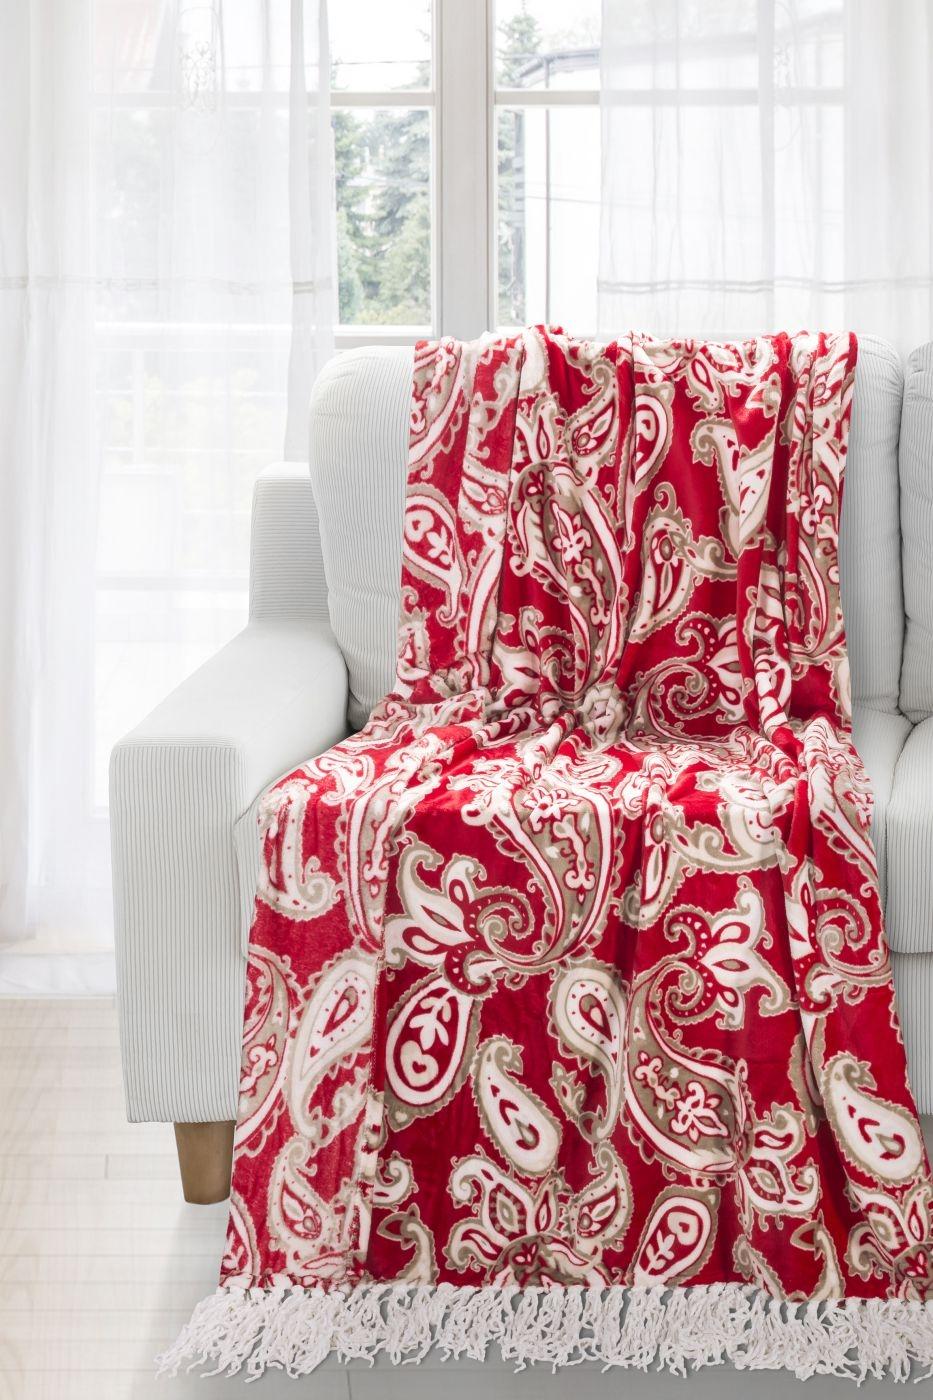 Patura Lily Red / Cream 150 x 200 cm